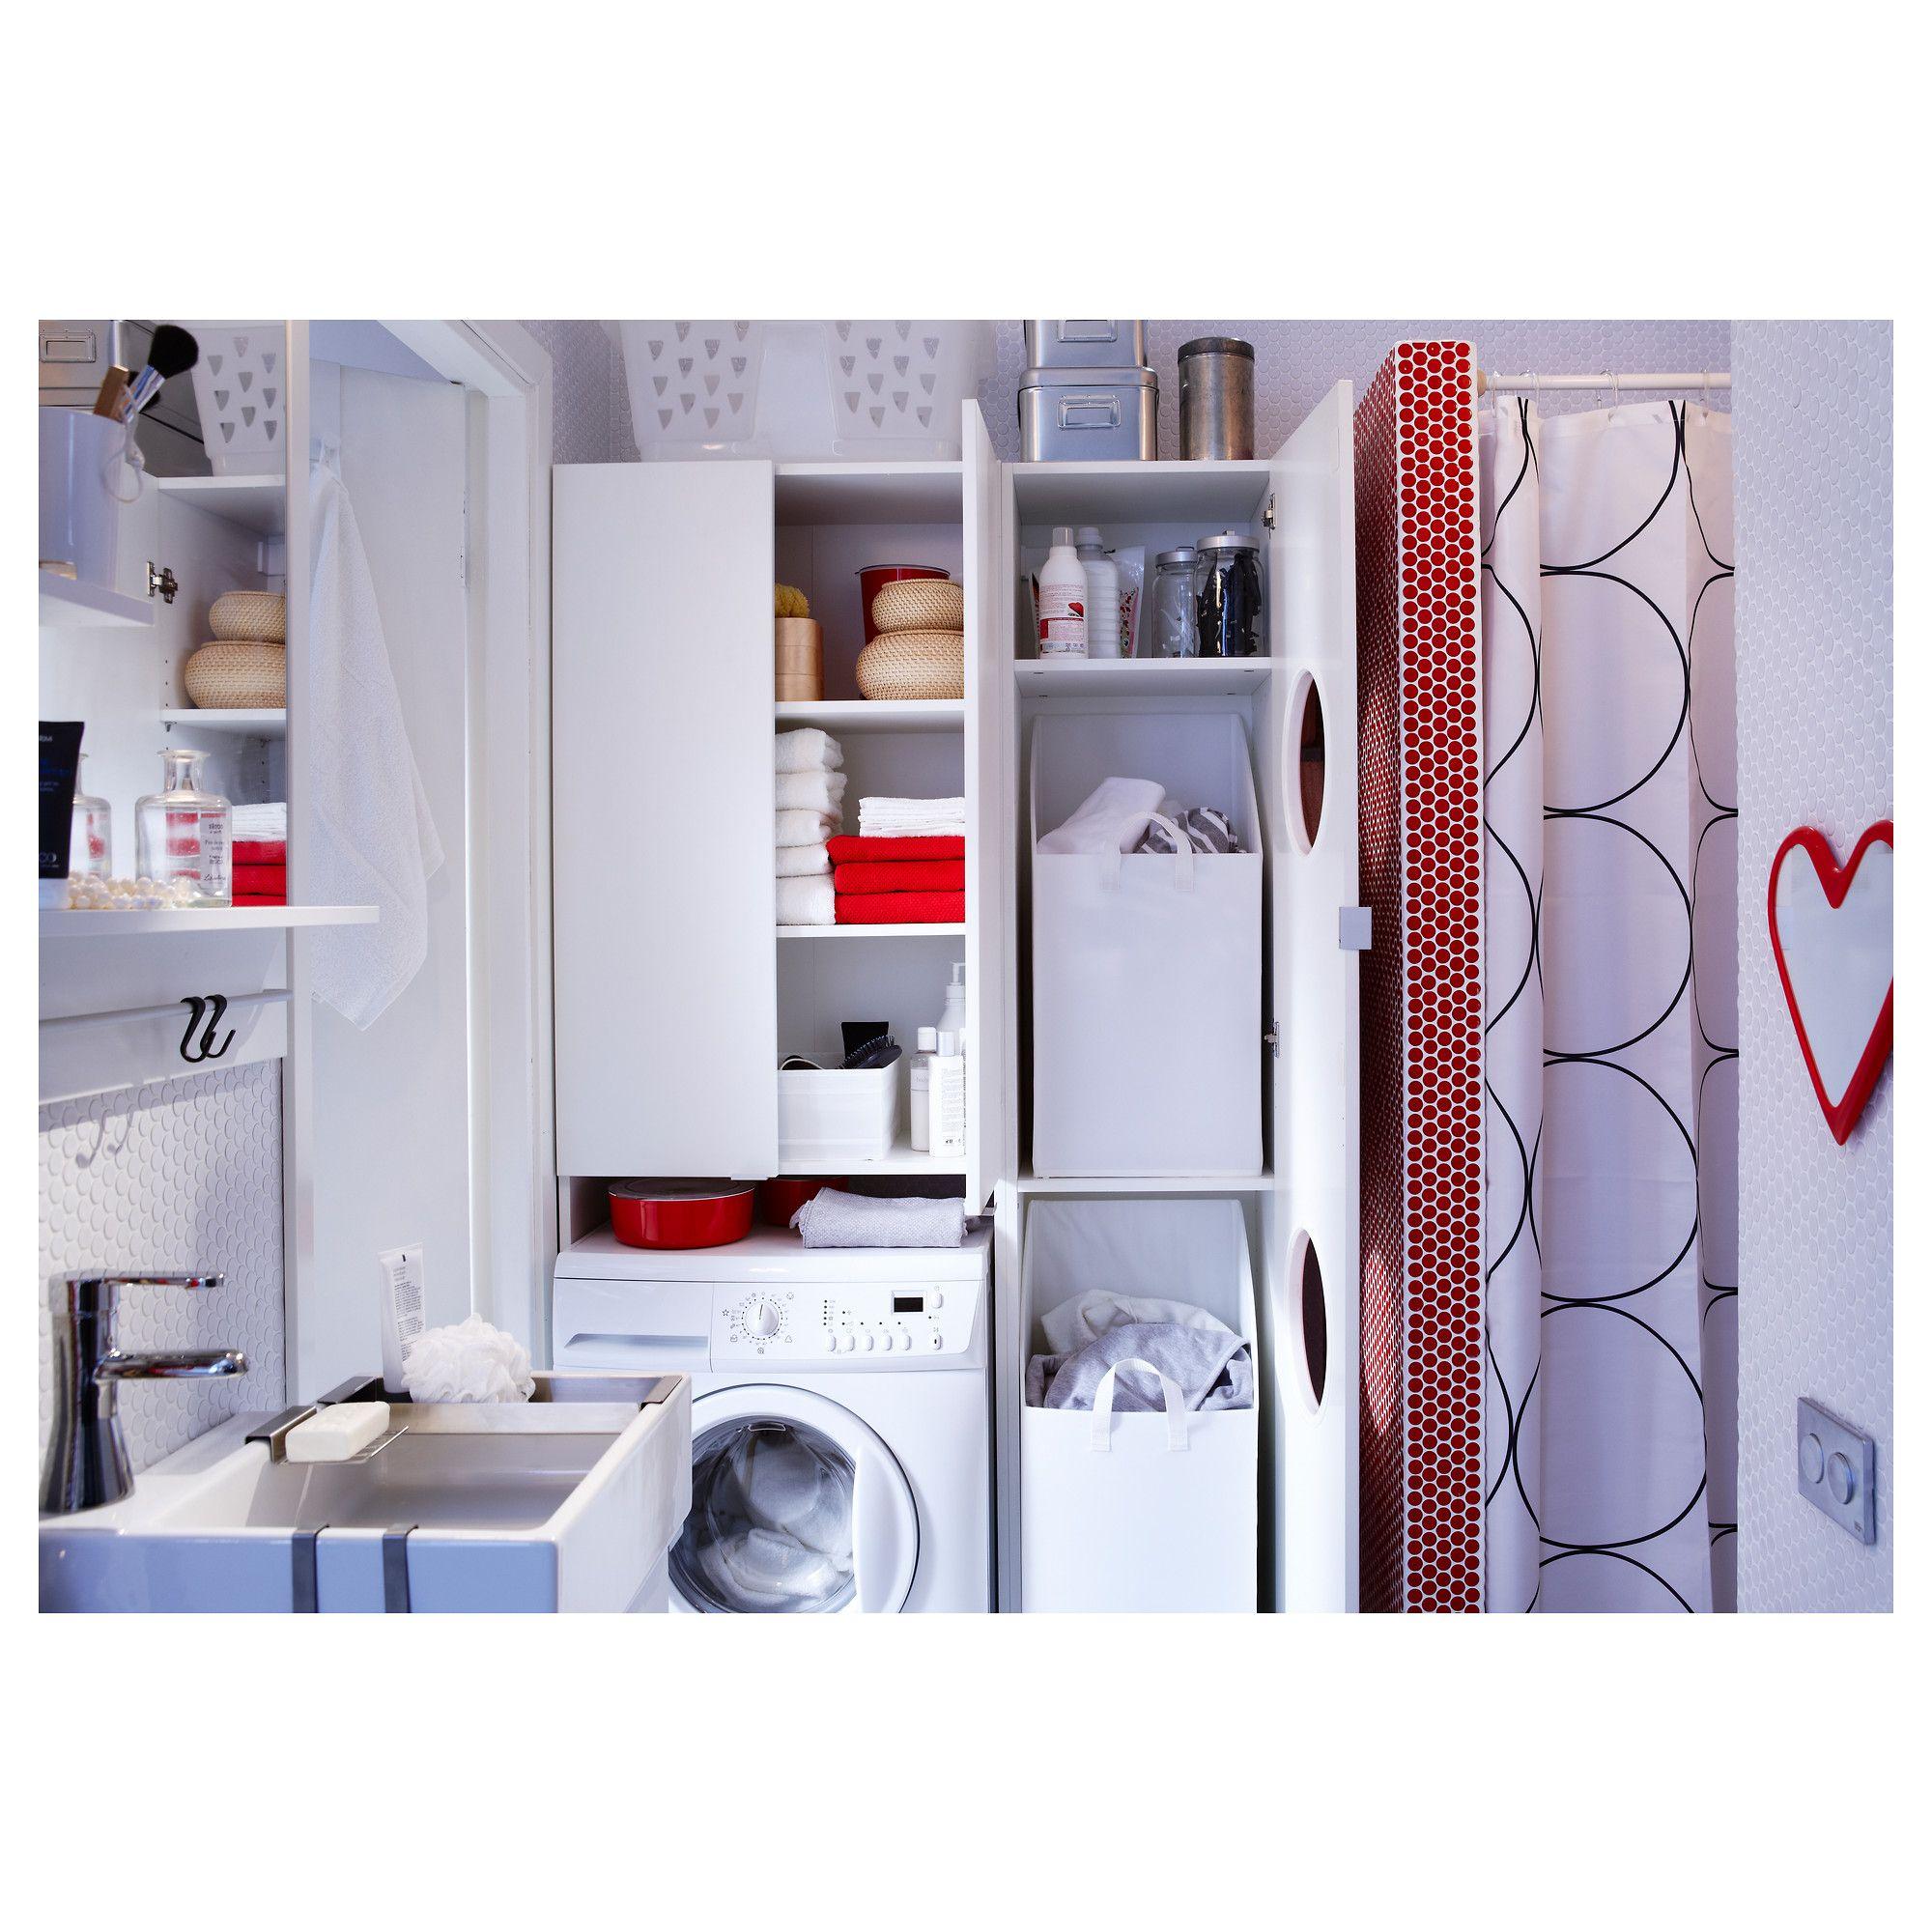 Lillangen Laundry Cabinet White 15 3 4x15x70 1 2 40x38x179 Cm